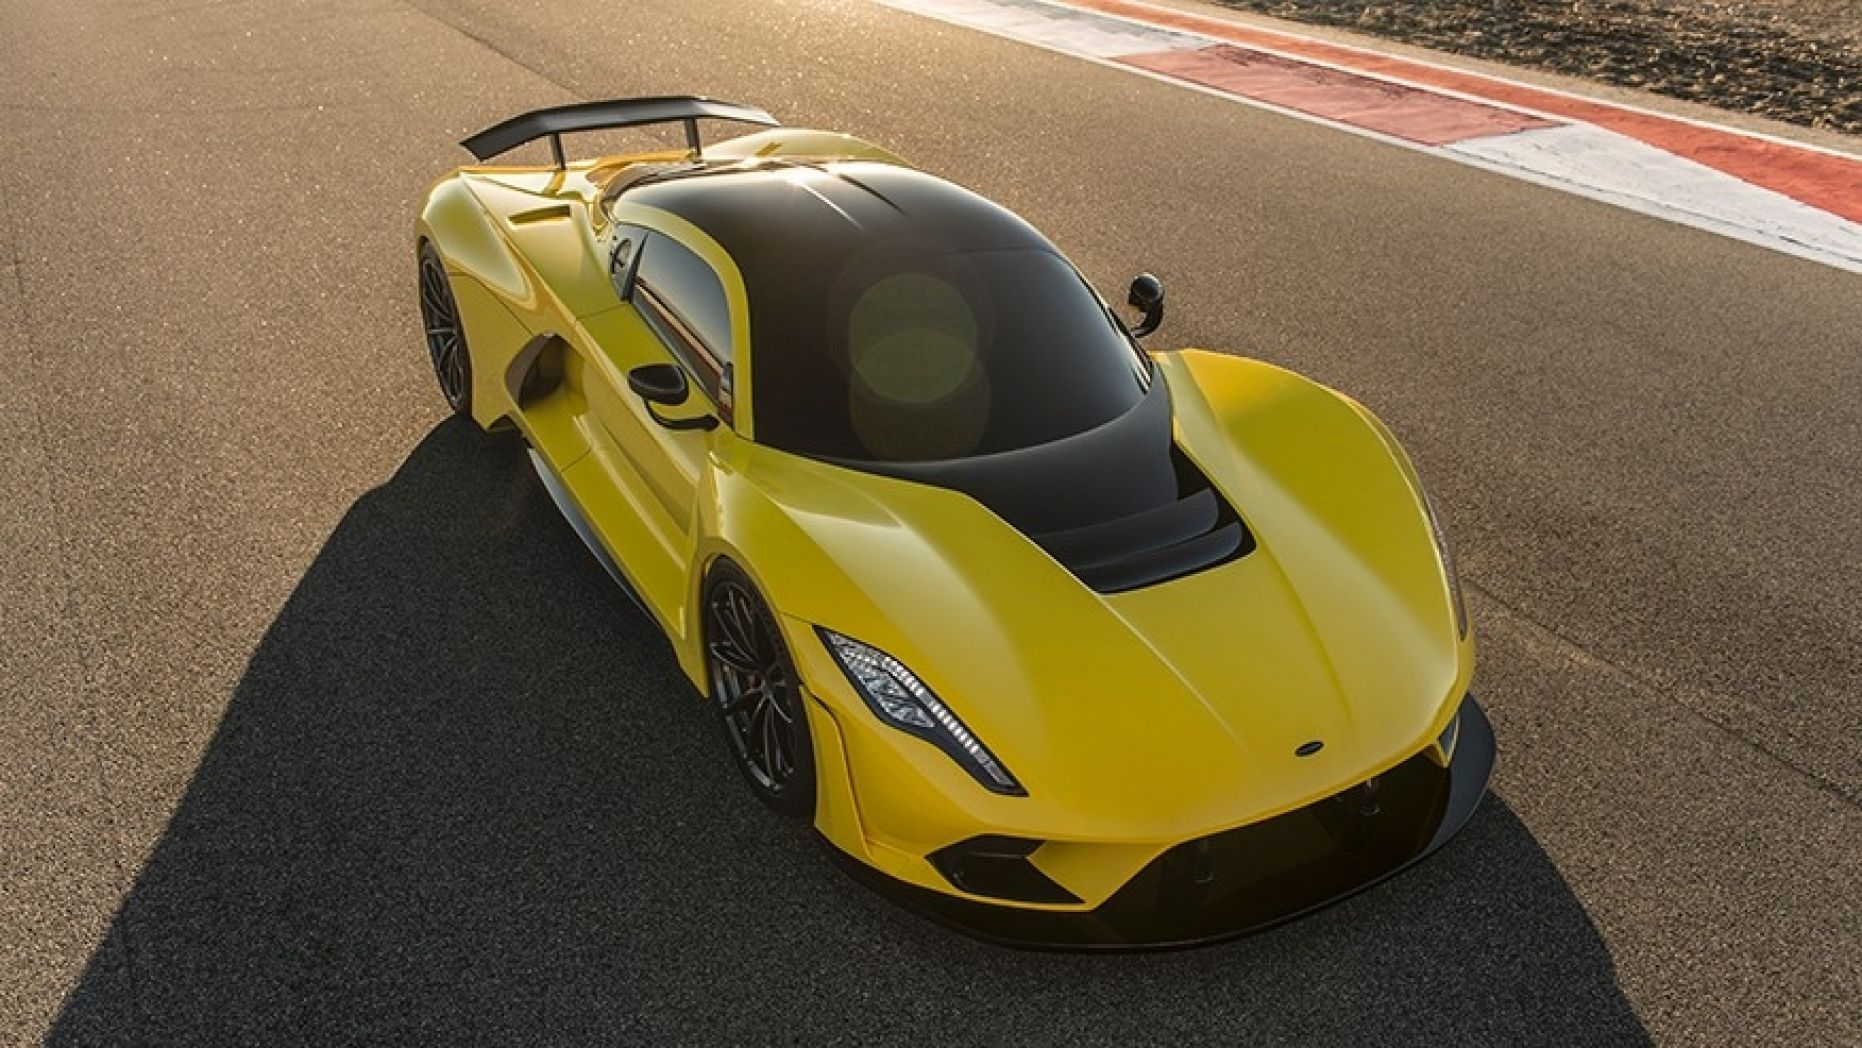 1 6 Million Hennessey Venom F5 Designed To Go 300 Mph Cool Sports Cars New Sports Cars Hennessey Venom Gt